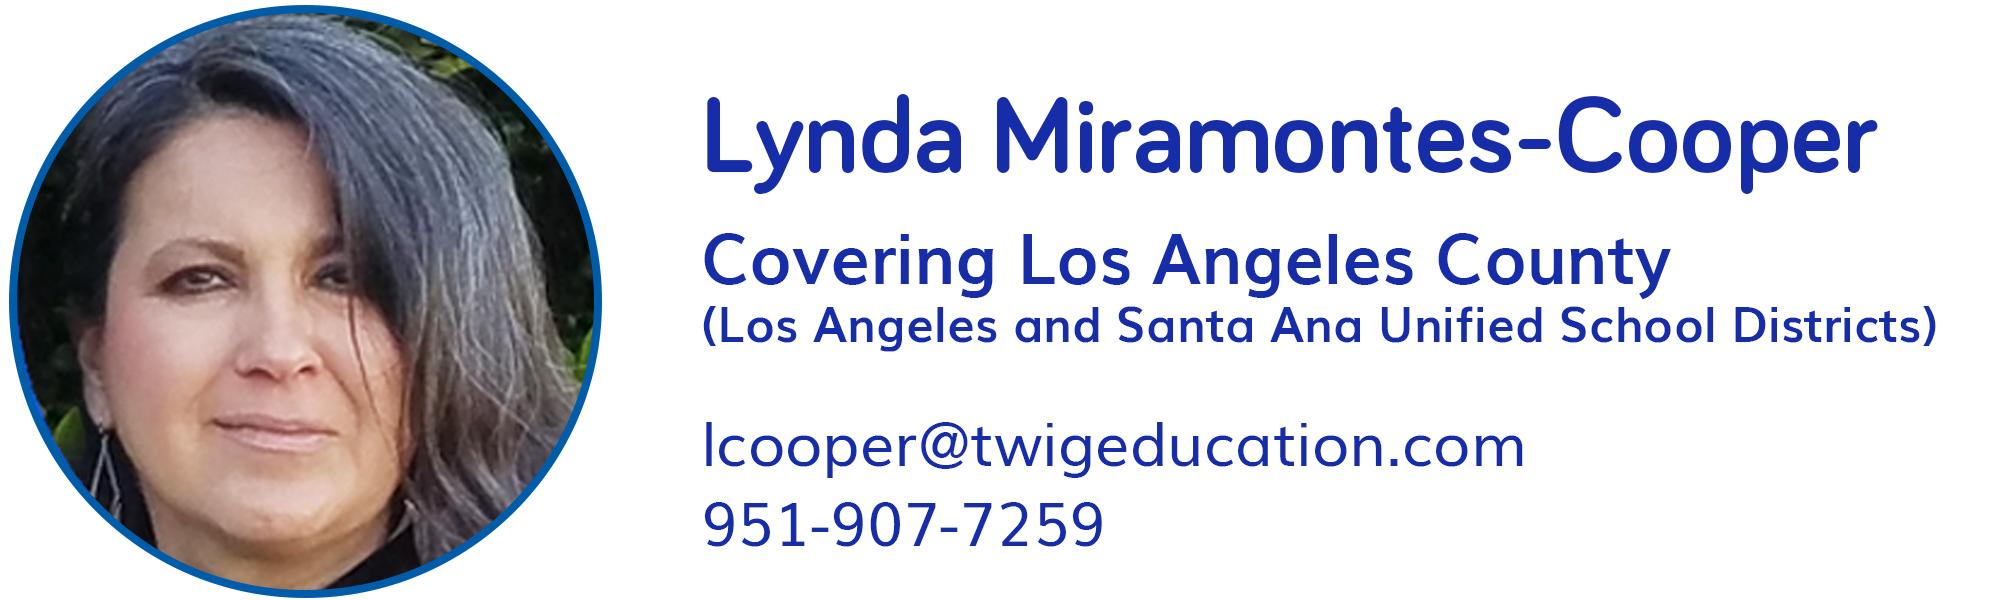 Lynda Miramontes-Cooper, lcooper@twigeducation.com, 951-907-7259